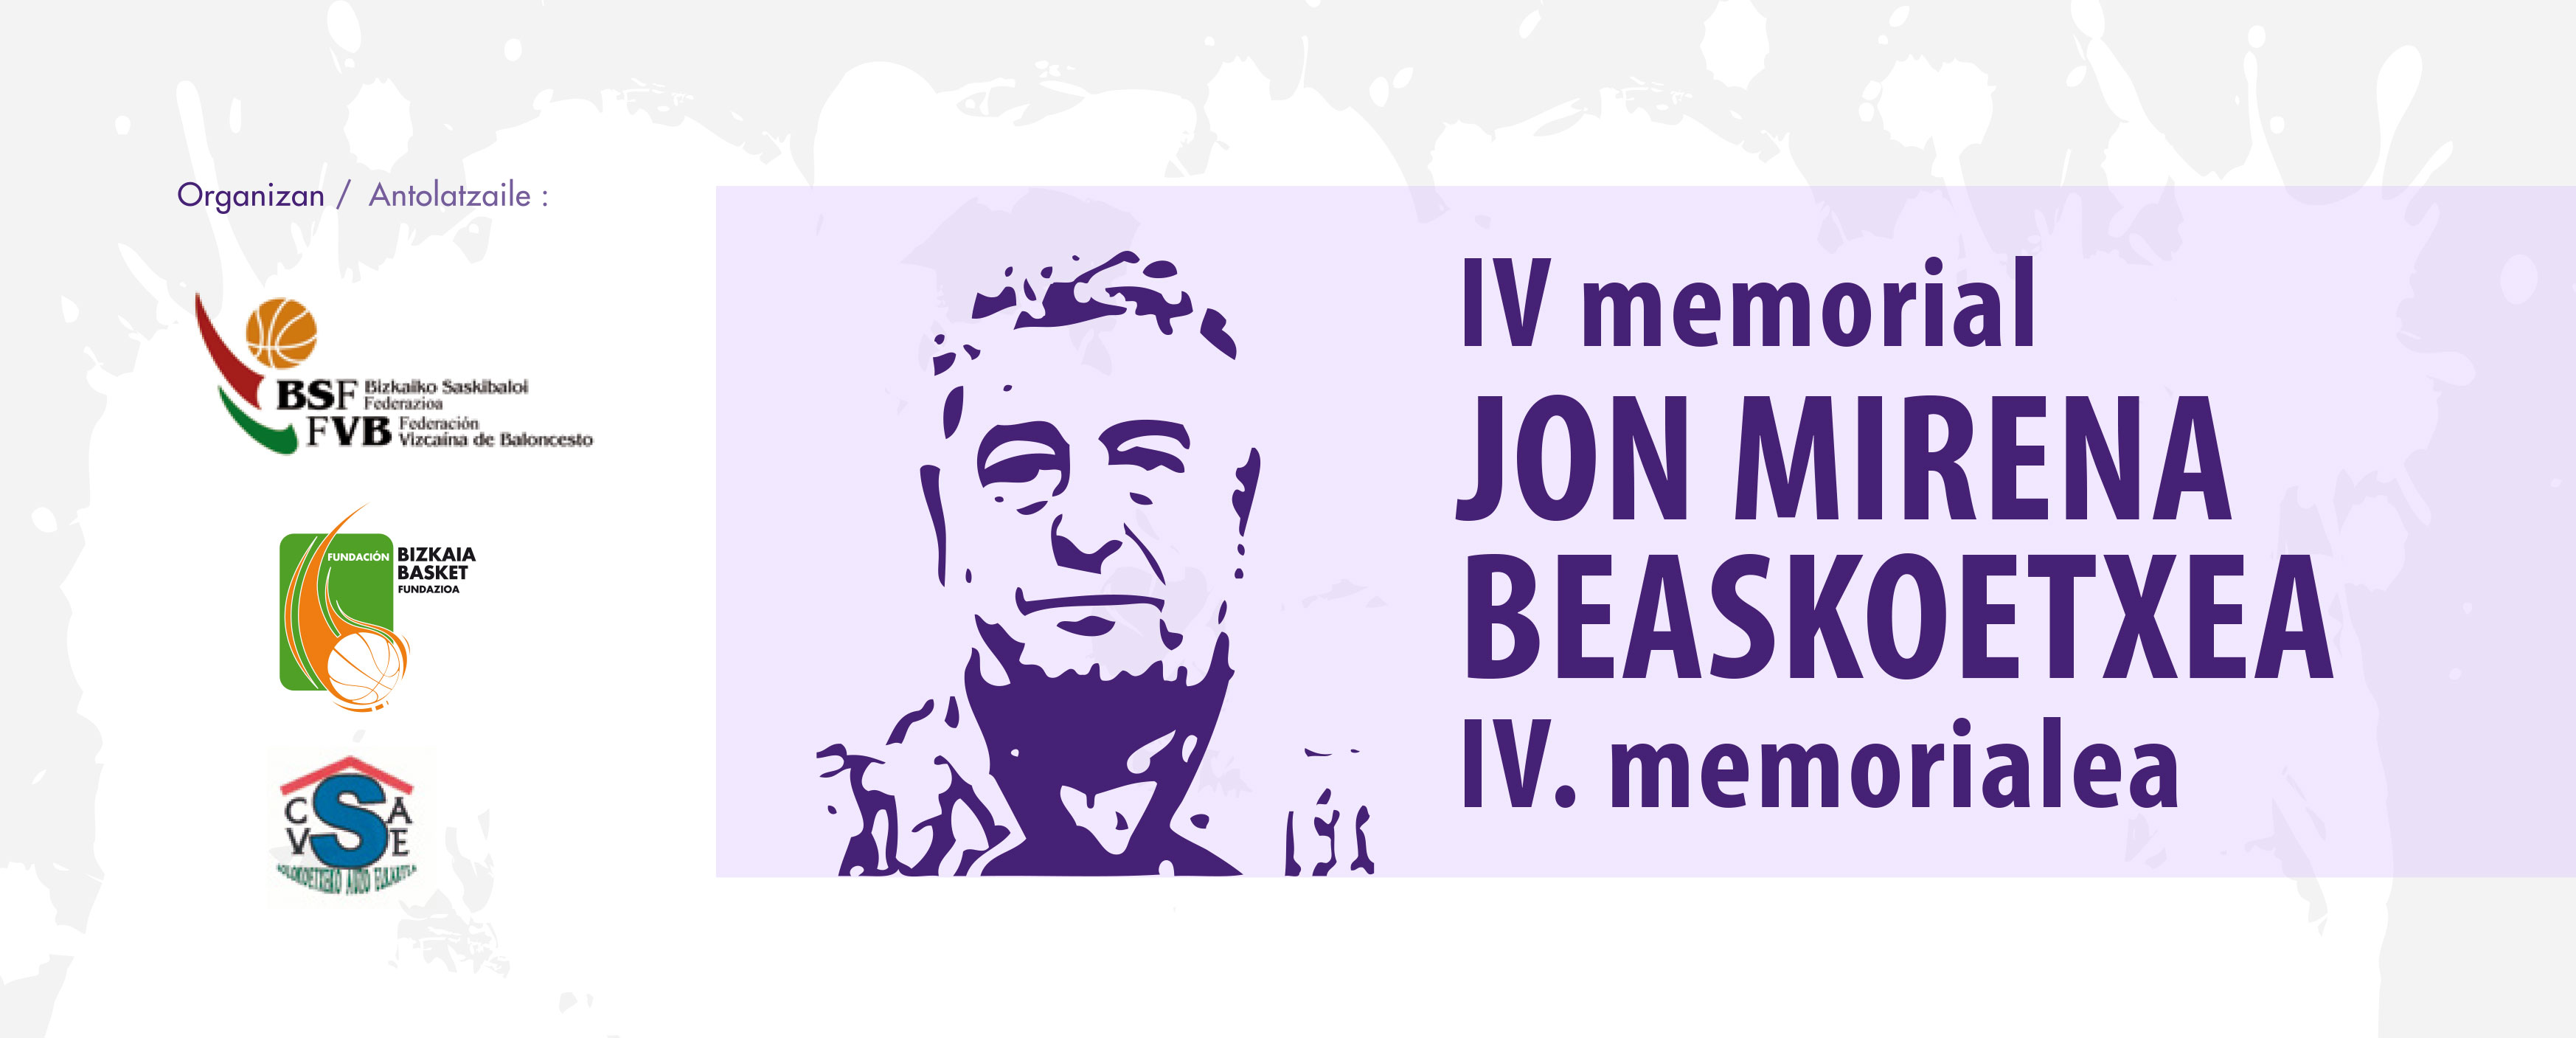 ¡Un nuevo Memorial Jon Mirena Beaskoetxea de largo alcance!